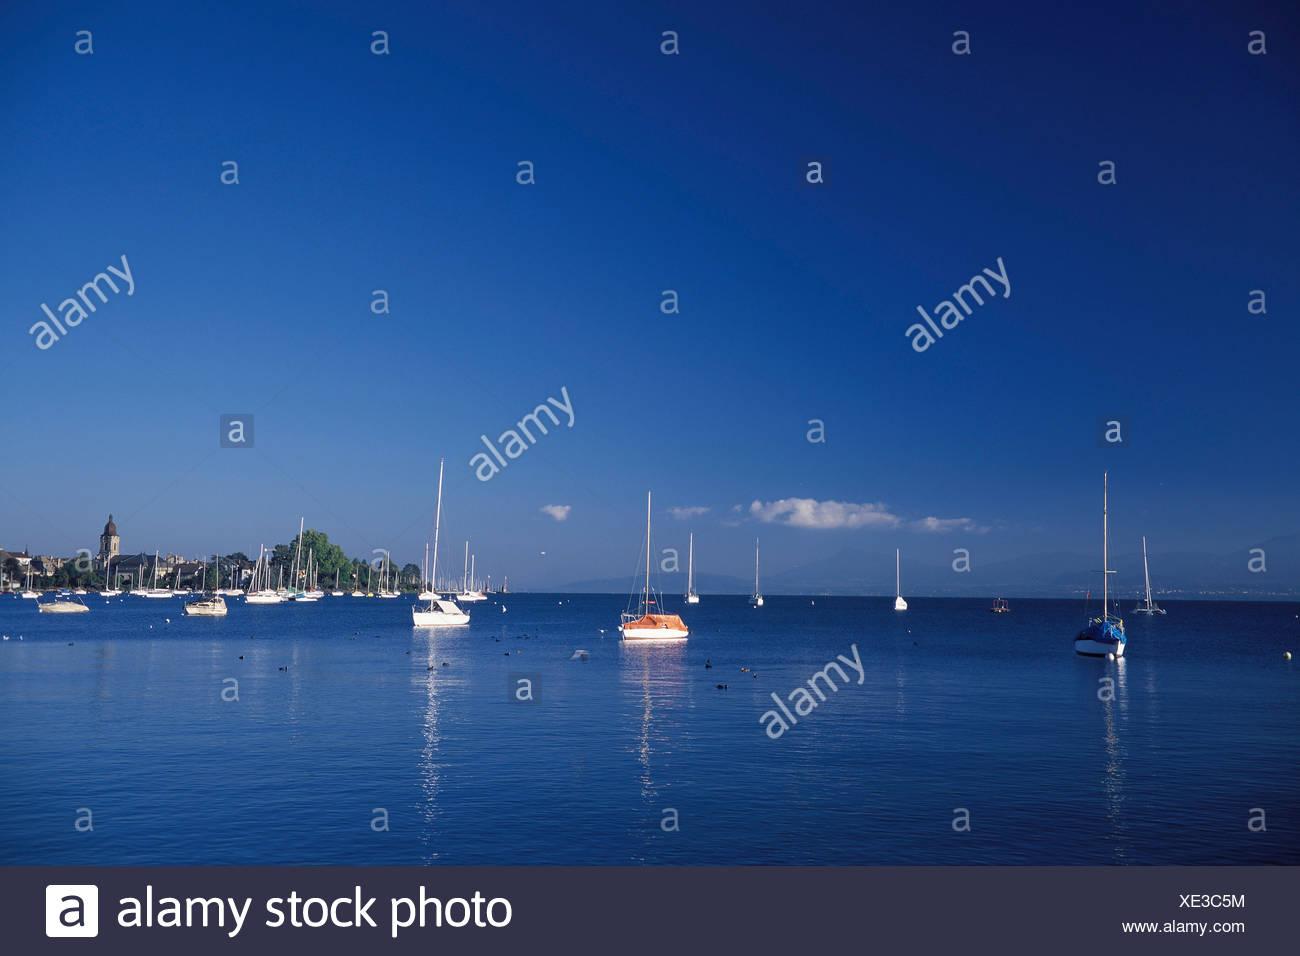 Vaud, harbour, port, scenery, ship, ships, ship, Morges, Switzerland, Europe, lake, Lac Léman, lake Geneva, blue, summer, - Stock Image